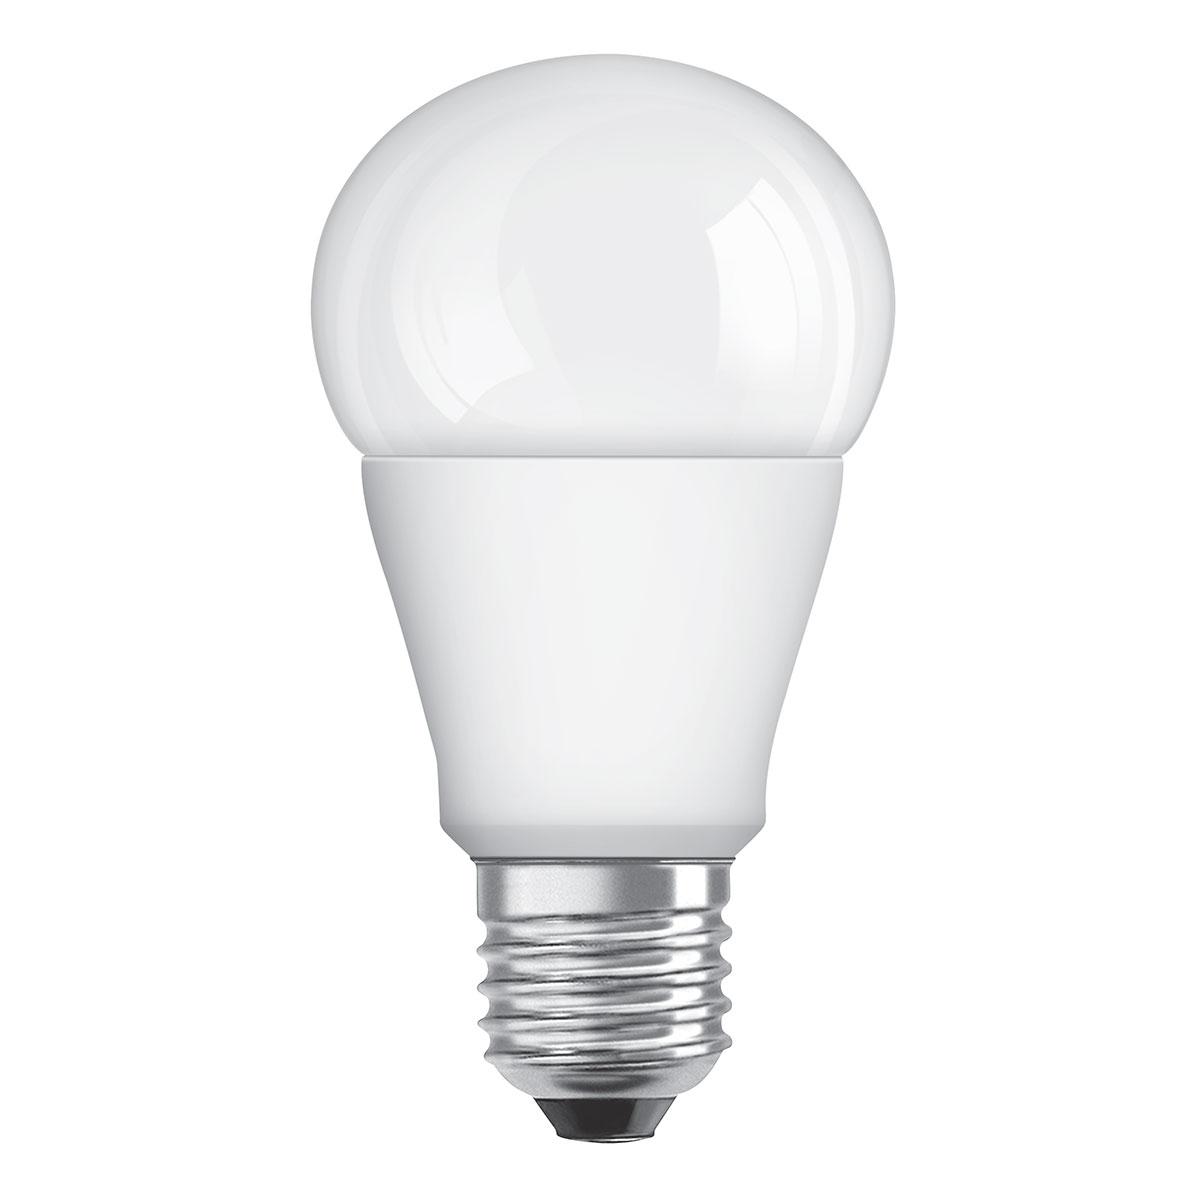 Osram Ampoule Led Retrofit Standard E27 4w 40w A: OSRAM Ampoule LED Star Classic Standard E27 10W (75W) A